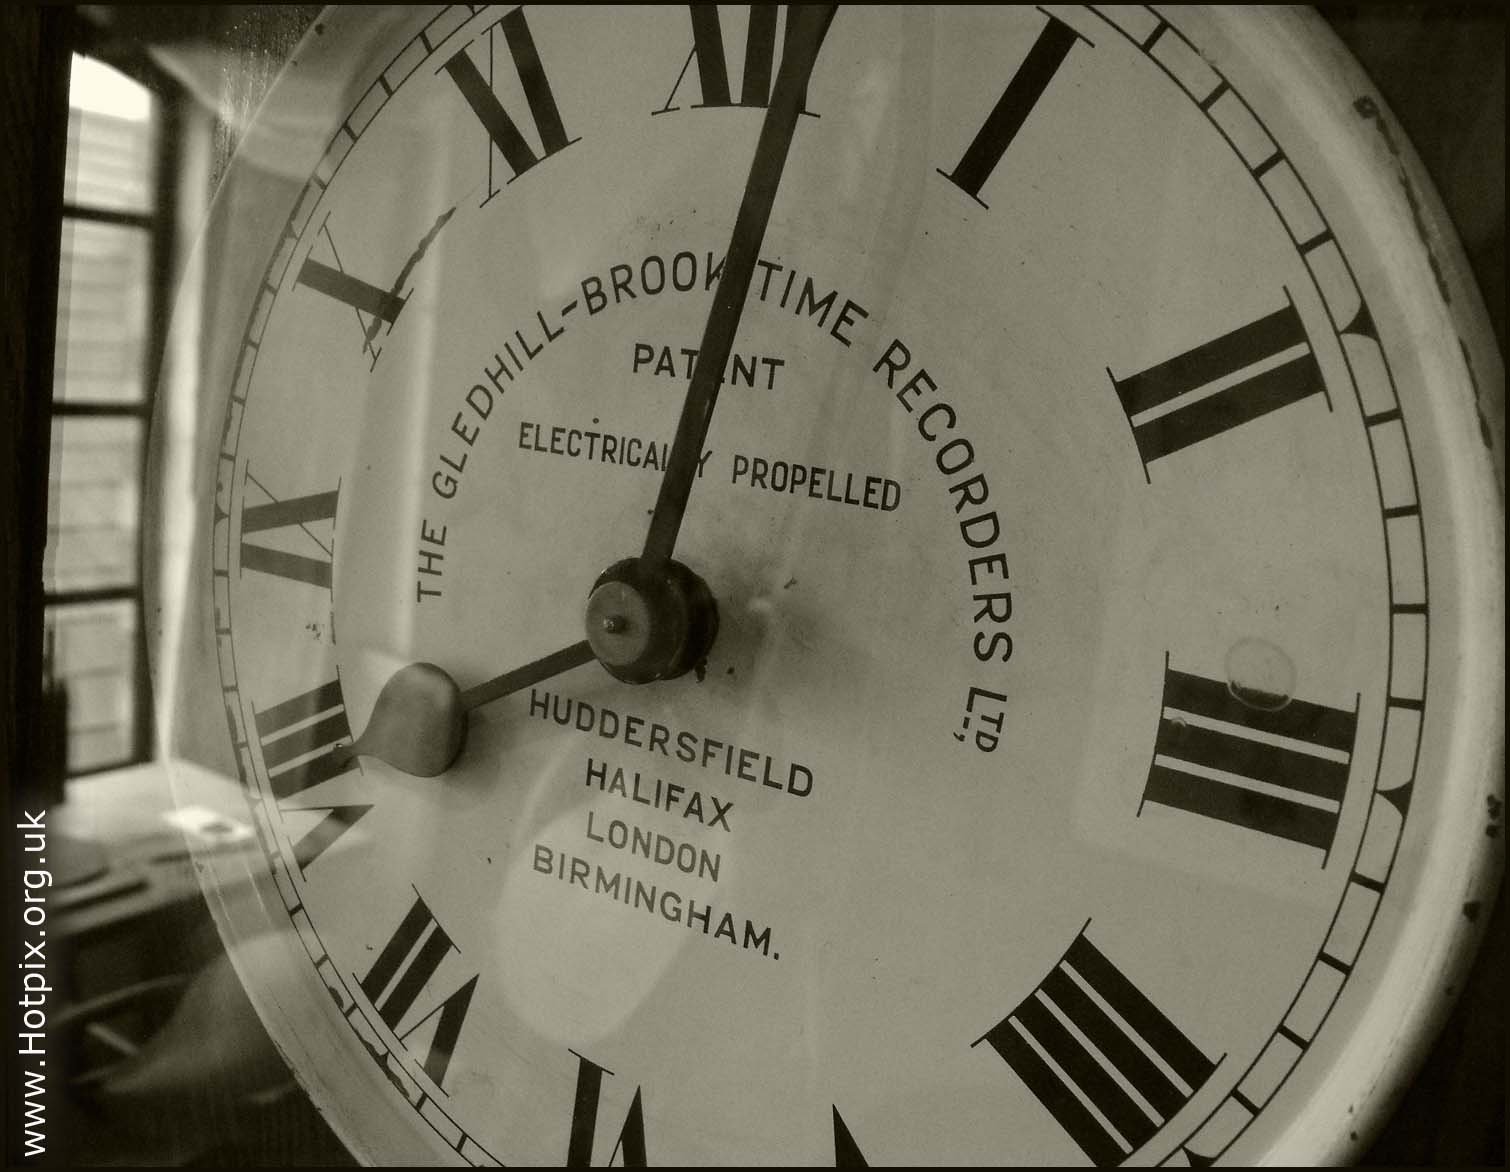 clock,Gledhill-Brook,Time,Recorder,clocking,machine,antique,old,very,sepia,black,white,mono,monochrome,hotpixuk,hotpix,tony,smith,tonysmith,walsall,england,midlands,britain,UK,clocks,horloge,reloj,orologio,Taktgeber,west,GB,europe,english,hotpics,hotpic,hotpick,hotpicks,stuff,history